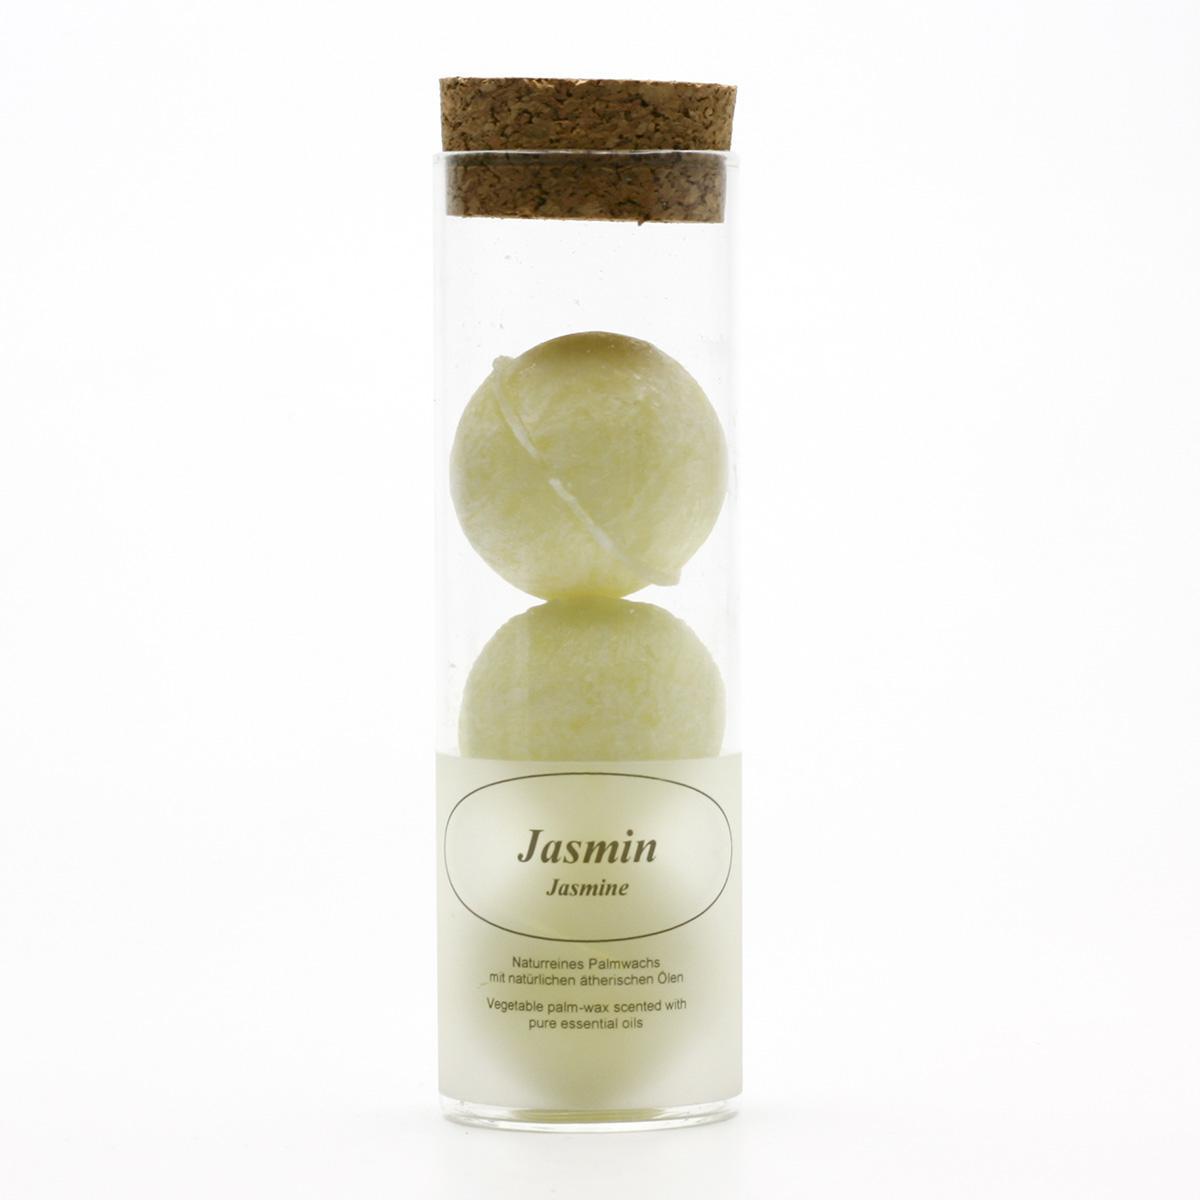 Kerzenfarm Kapsle do aromalampy, Jasmine 6 ks, dóza